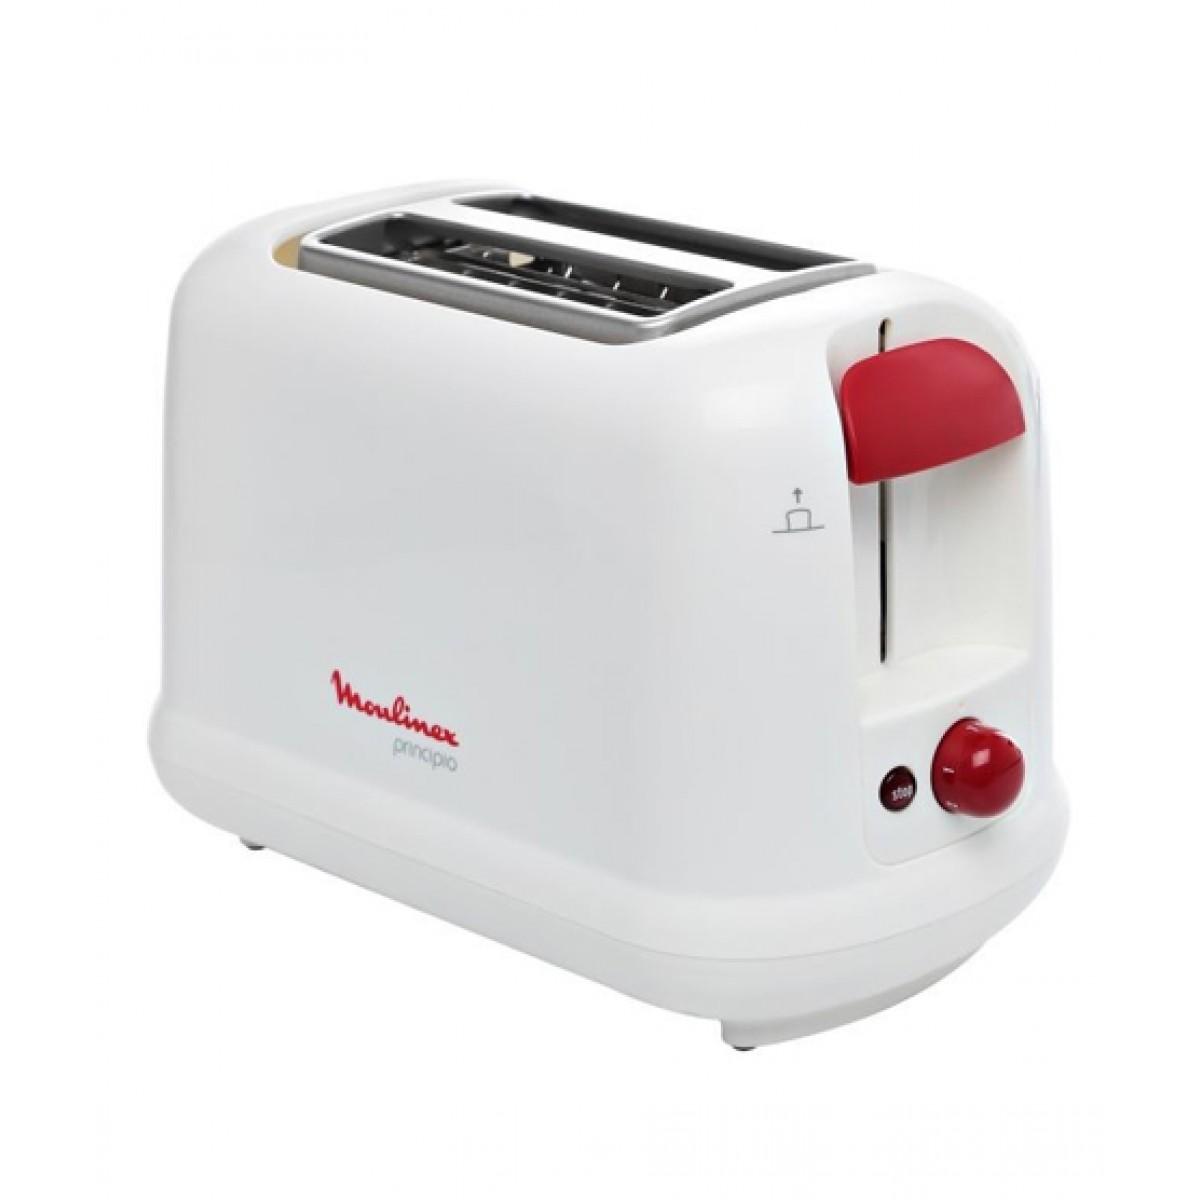 Moulinex Principio Toaster (LT160127)